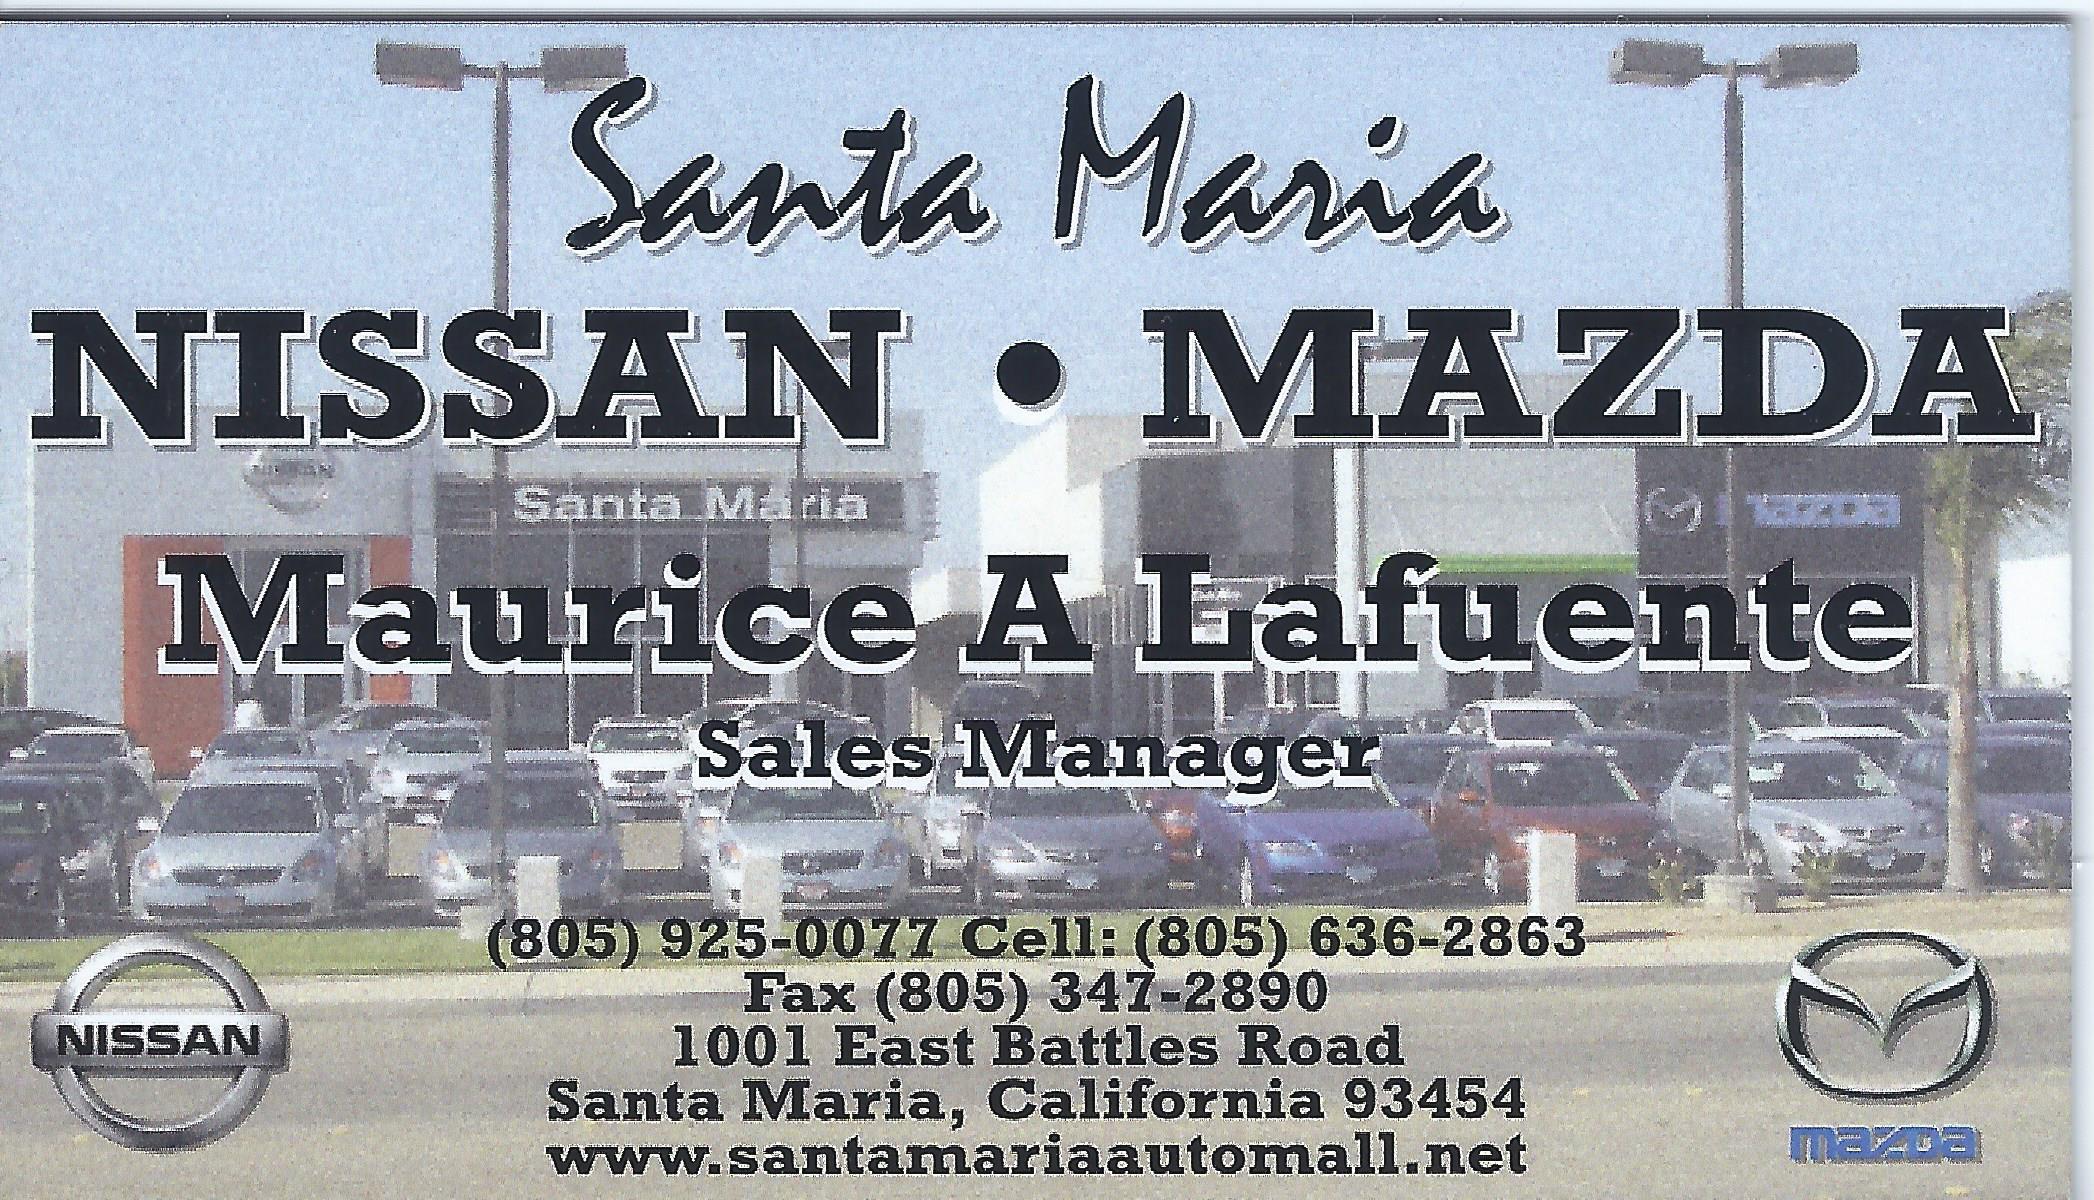 SM Nissan Mazda - Maurice LaFuente